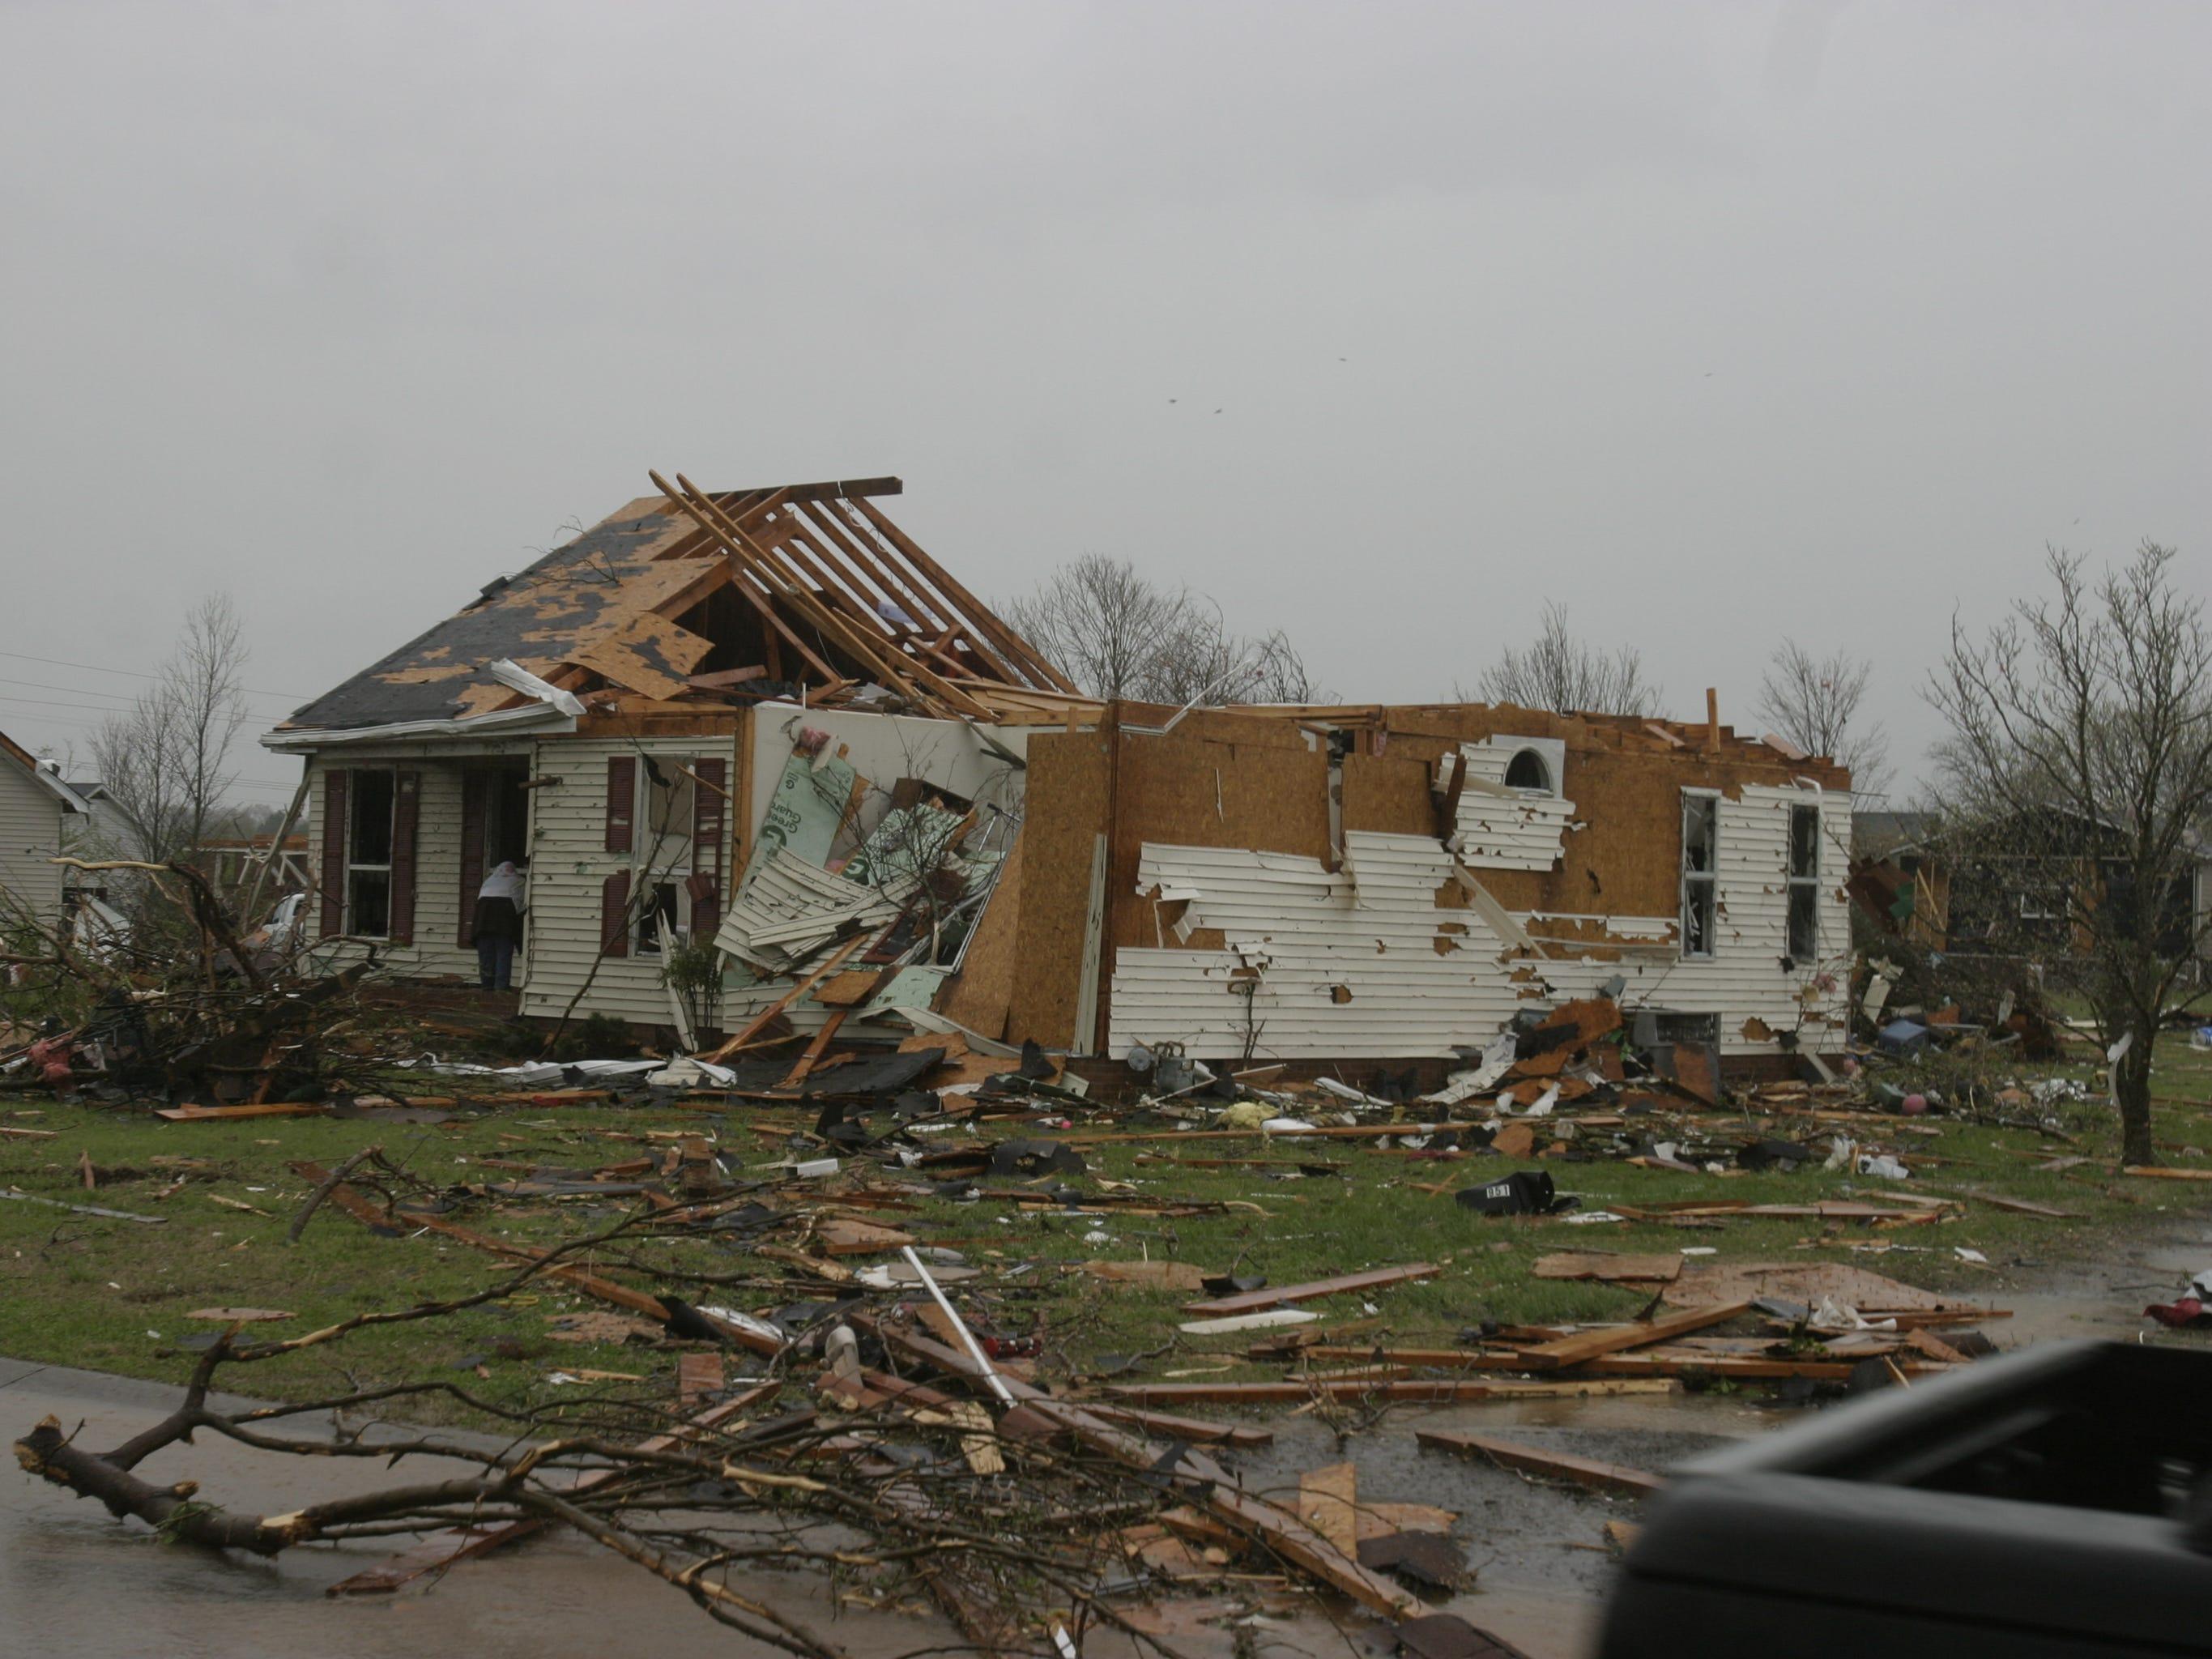 Penny Lane, Murfreesboro